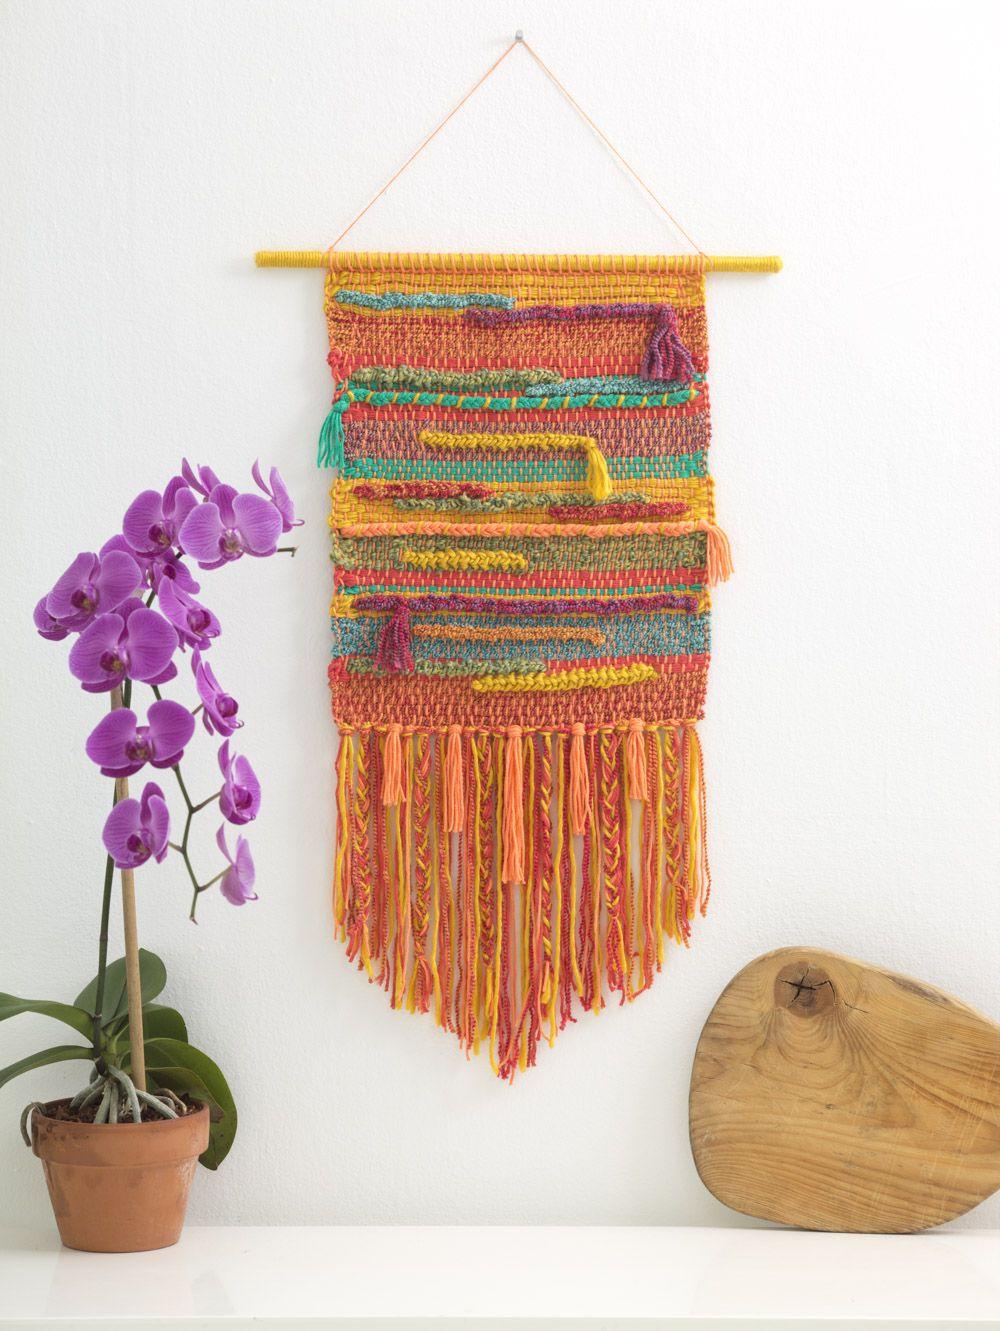 wall hangings made on a peg loom - Google Search | Alto Lizo ...